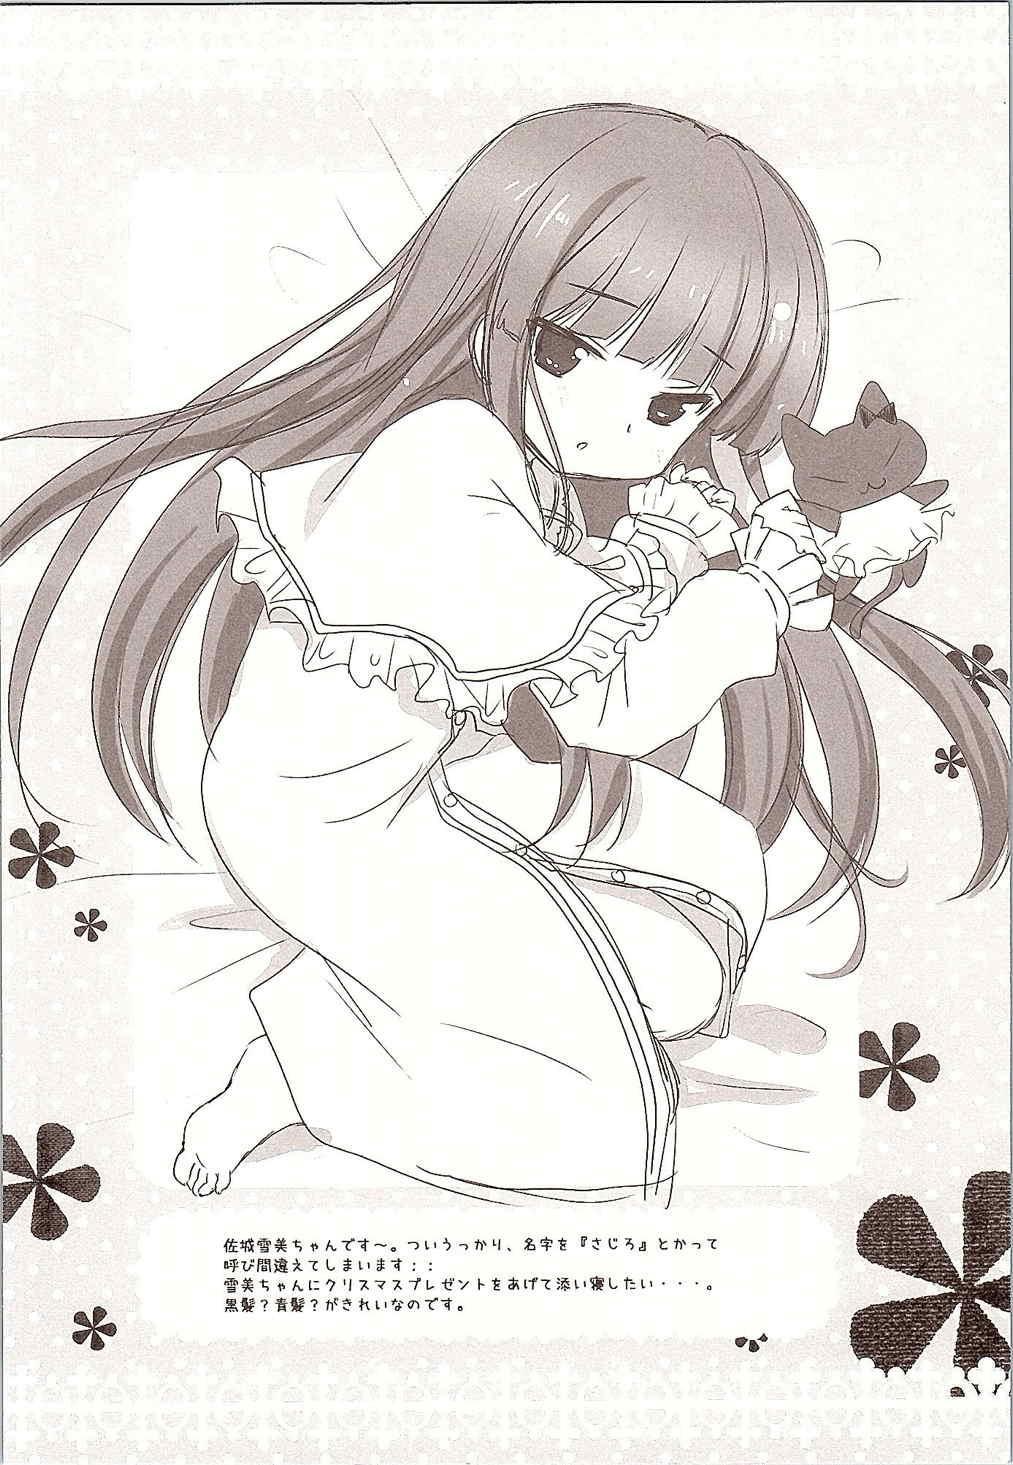 Nina-chan to, Issho. 30